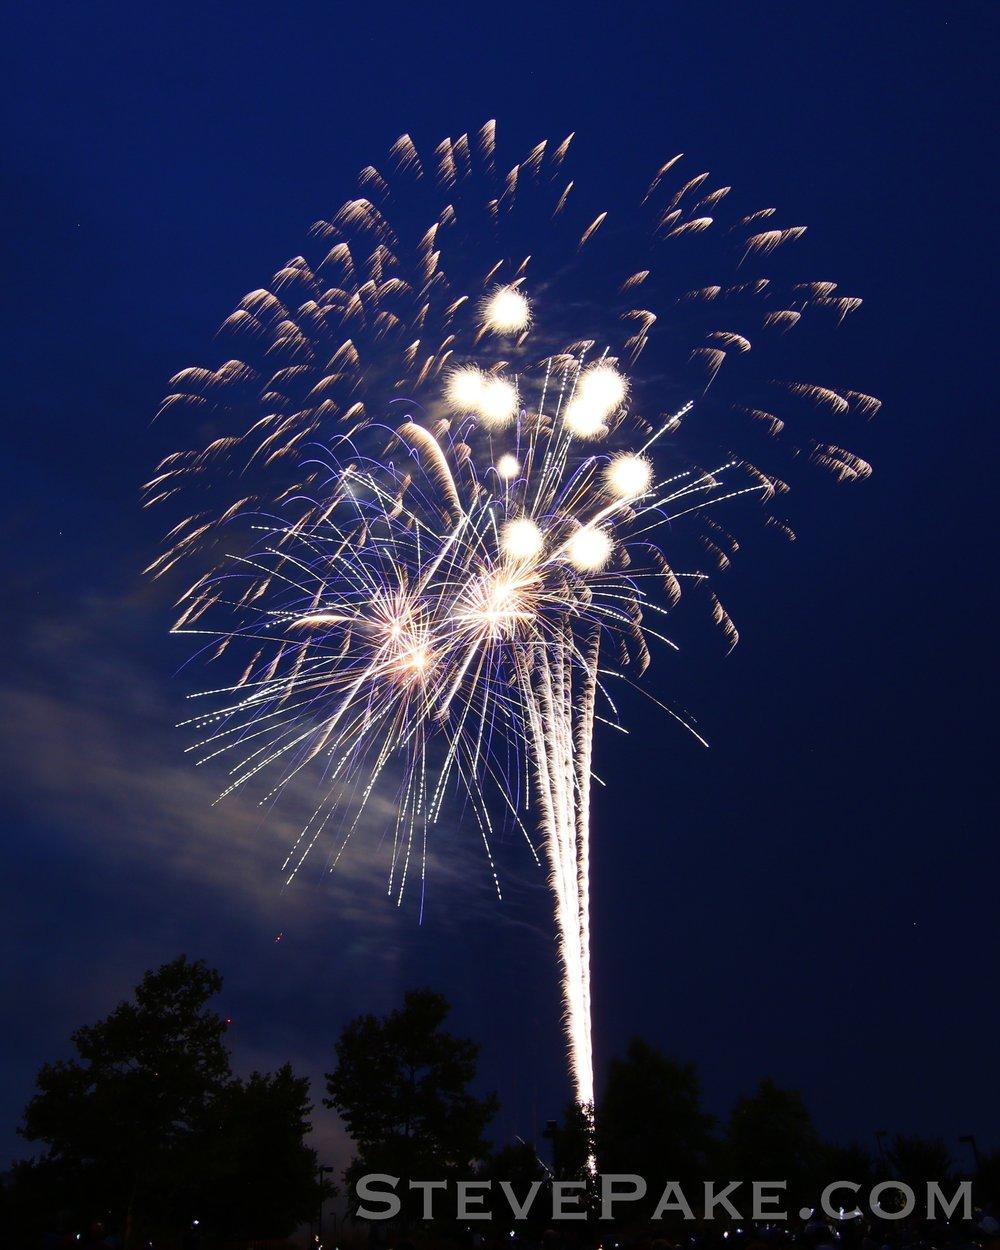 Fireworks2018_10_GE3A8508ap-HD-WM.jpg